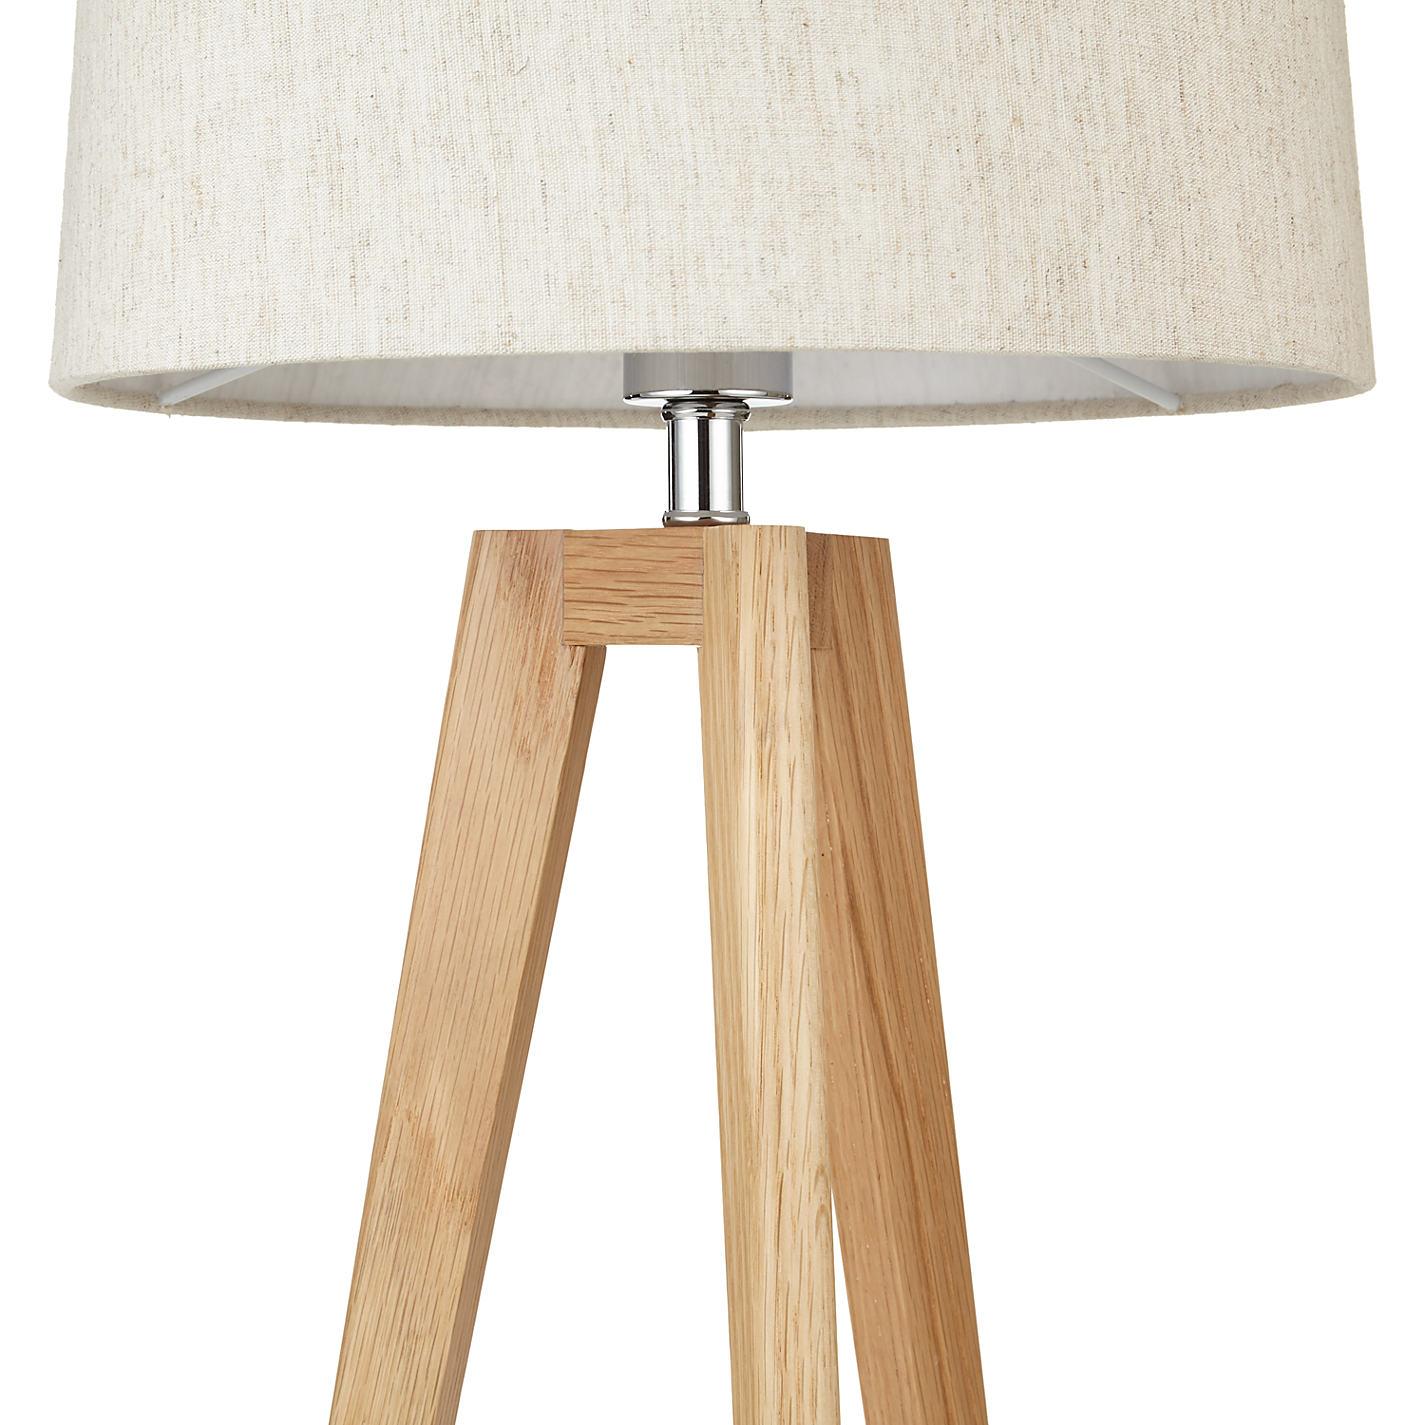 Buy john lewis brace table lamp oak john lewis buy john lewis brace table lamp oak online at johnlewis geotapseo Image collections